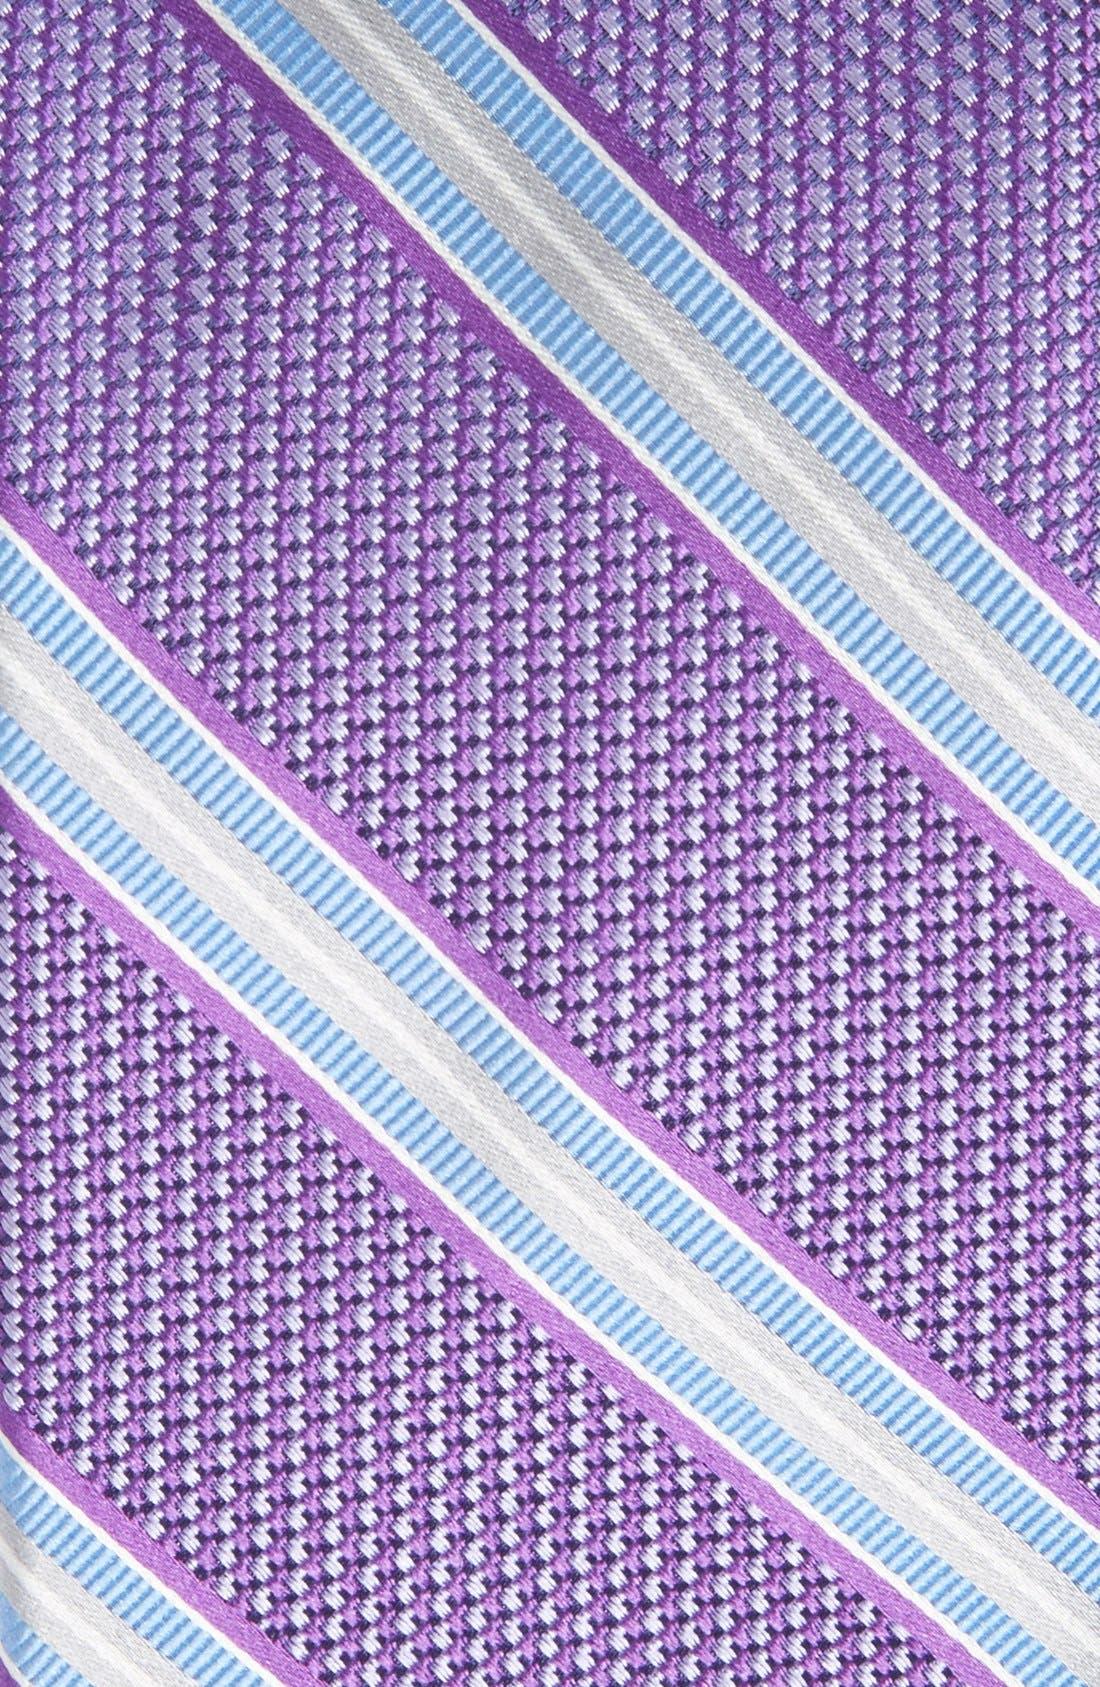 Alternate Image 2  - John W. Nordstrom® 'Robinson' Woven Silk Tie